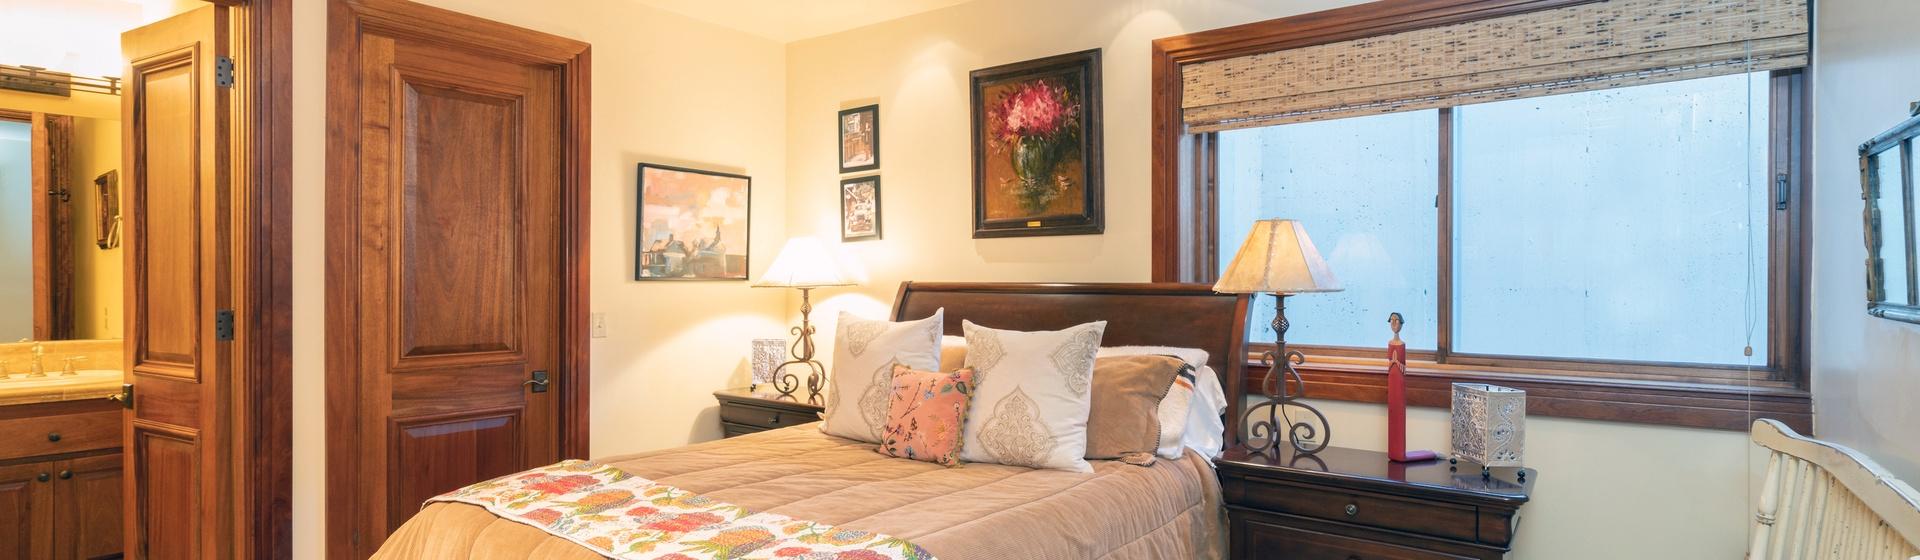 2.06-telluride-tres-casas-B-guest-bedroom-web.jpg